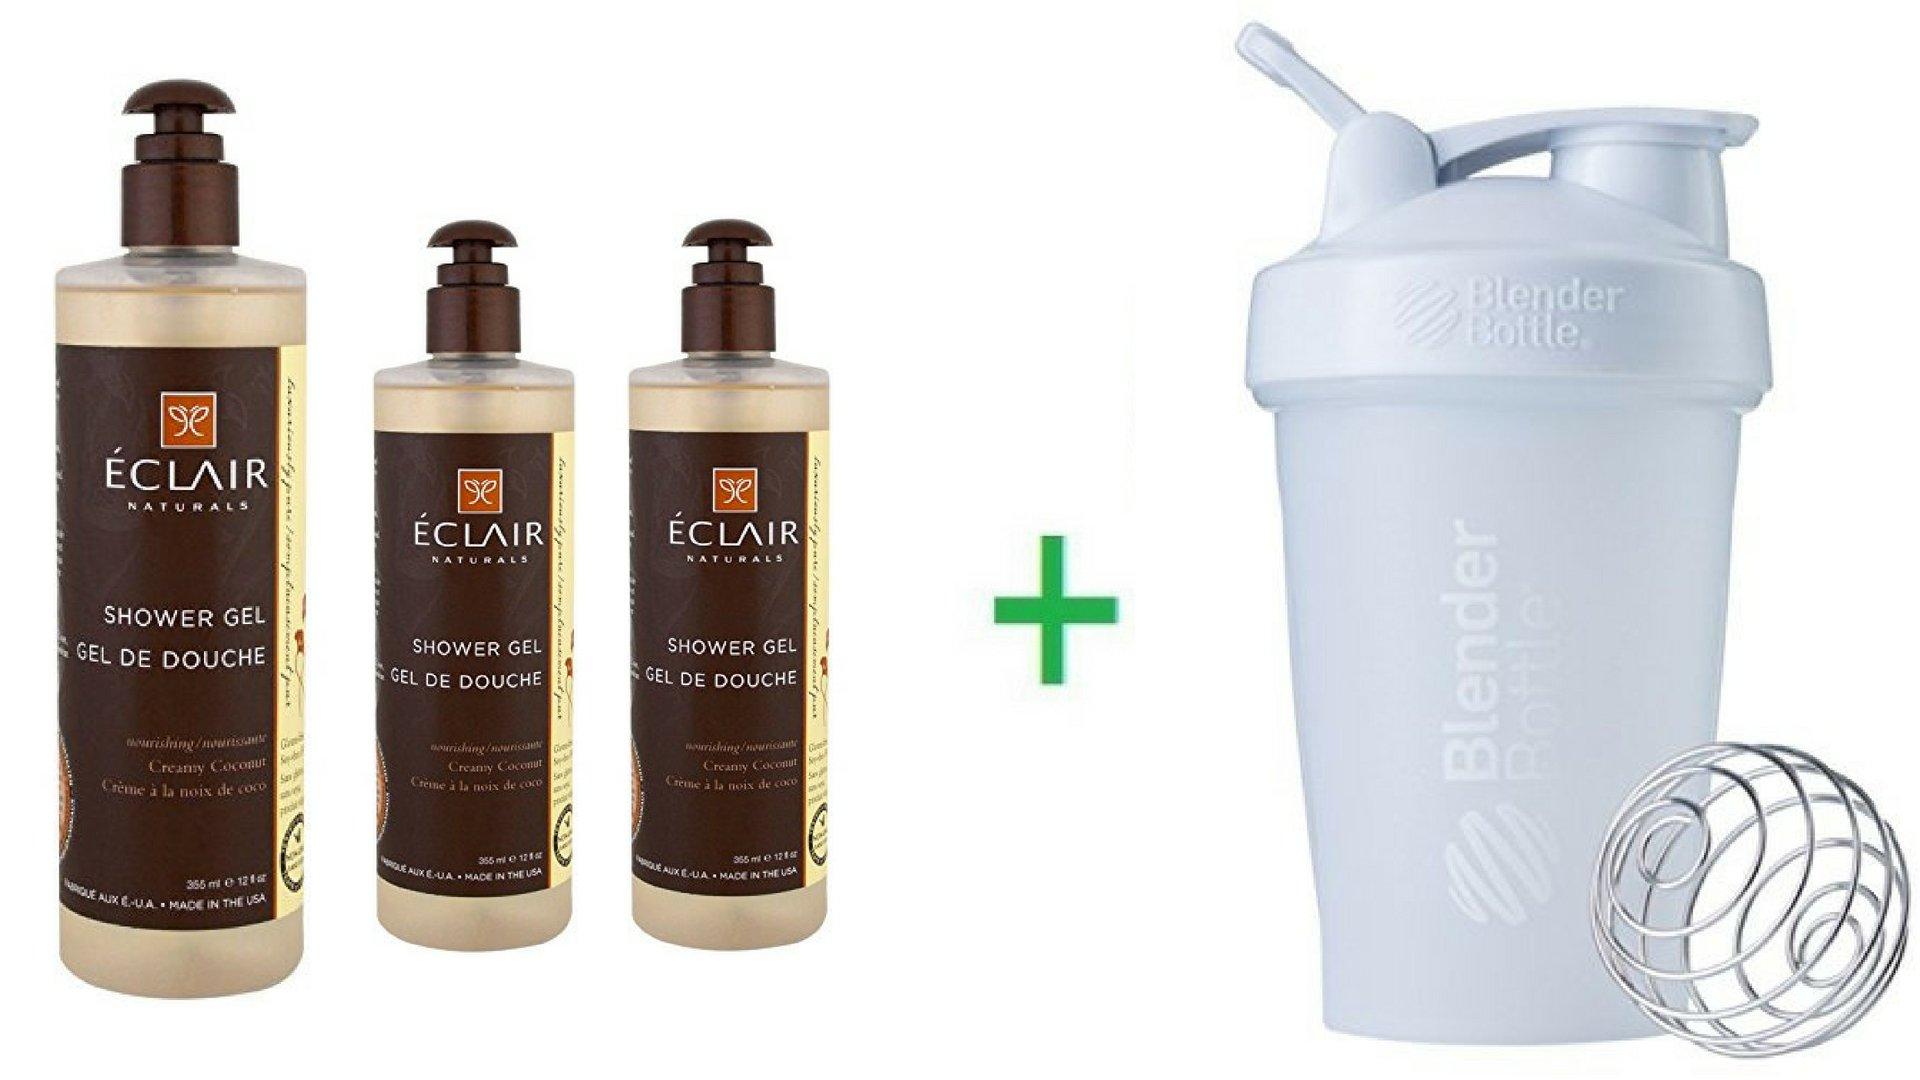 Eclair Naturals, Shower Gel, Creamy Coconut, 12 fl oz (355 ml) (3 Packs) + Sundesa, BlenderBottle, Classic With Loop, White, 20 oz